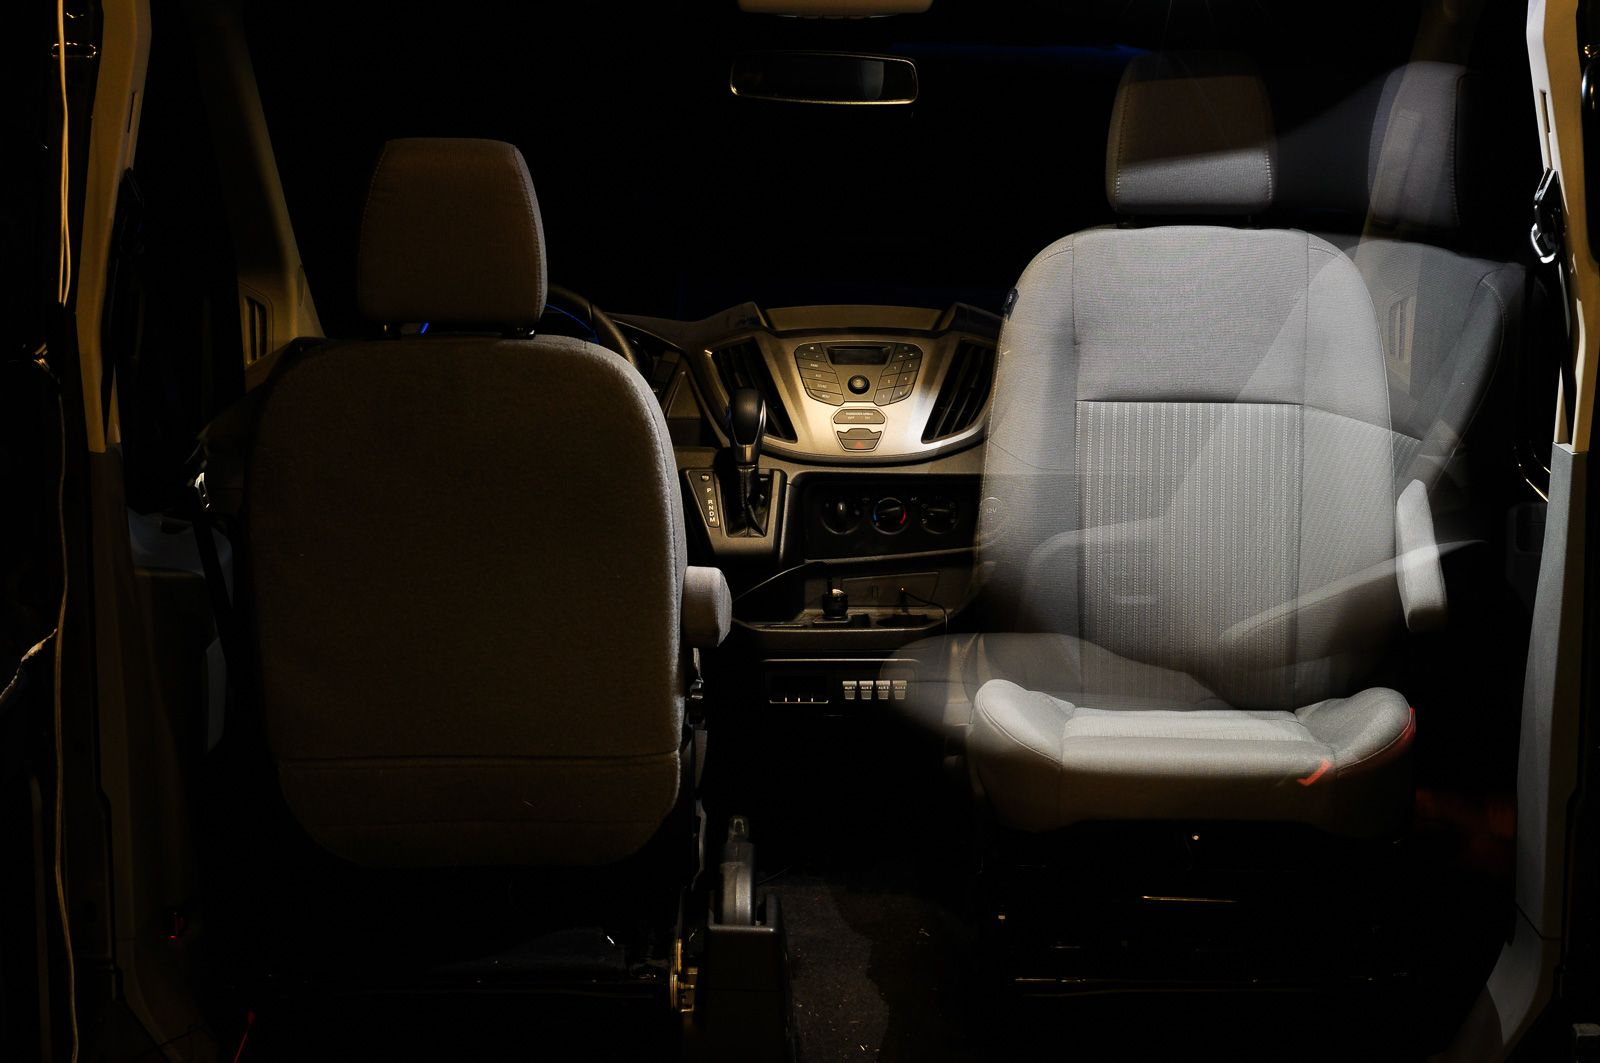 Passenger Swivel Seat Installation Ford Transit Campervan Ford Transit Van Conversion